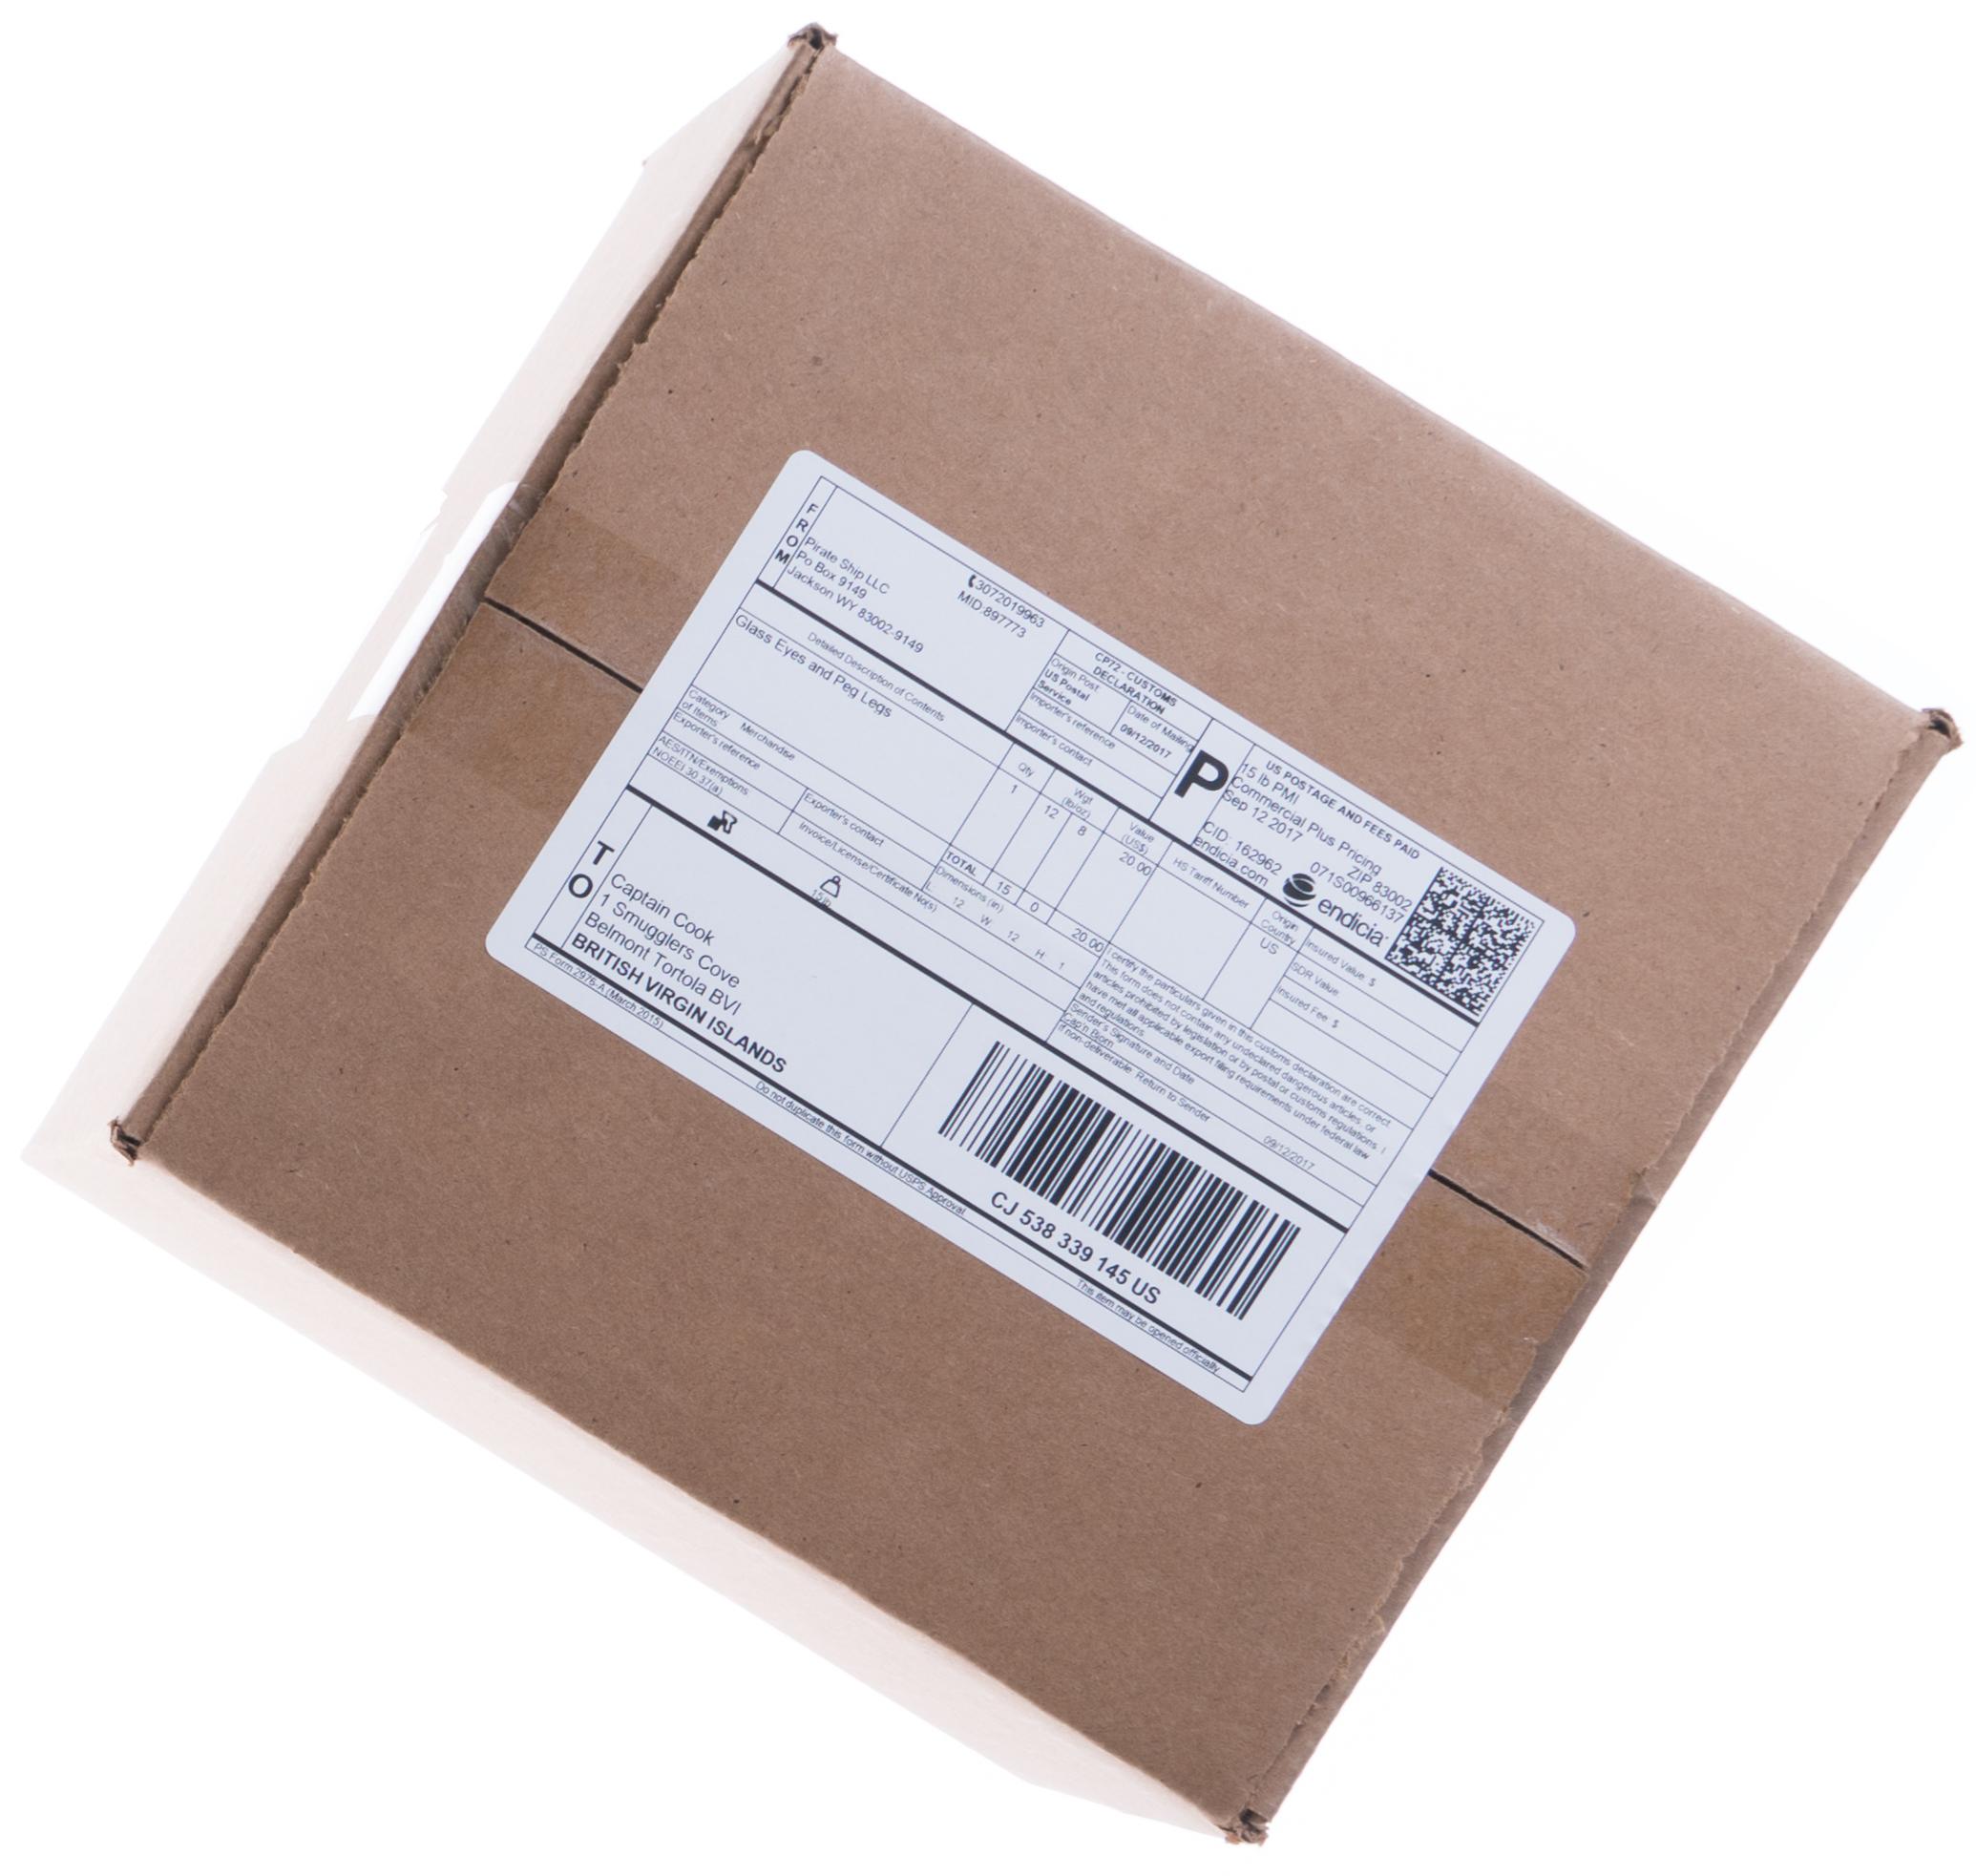 USPS Priority Mail International box